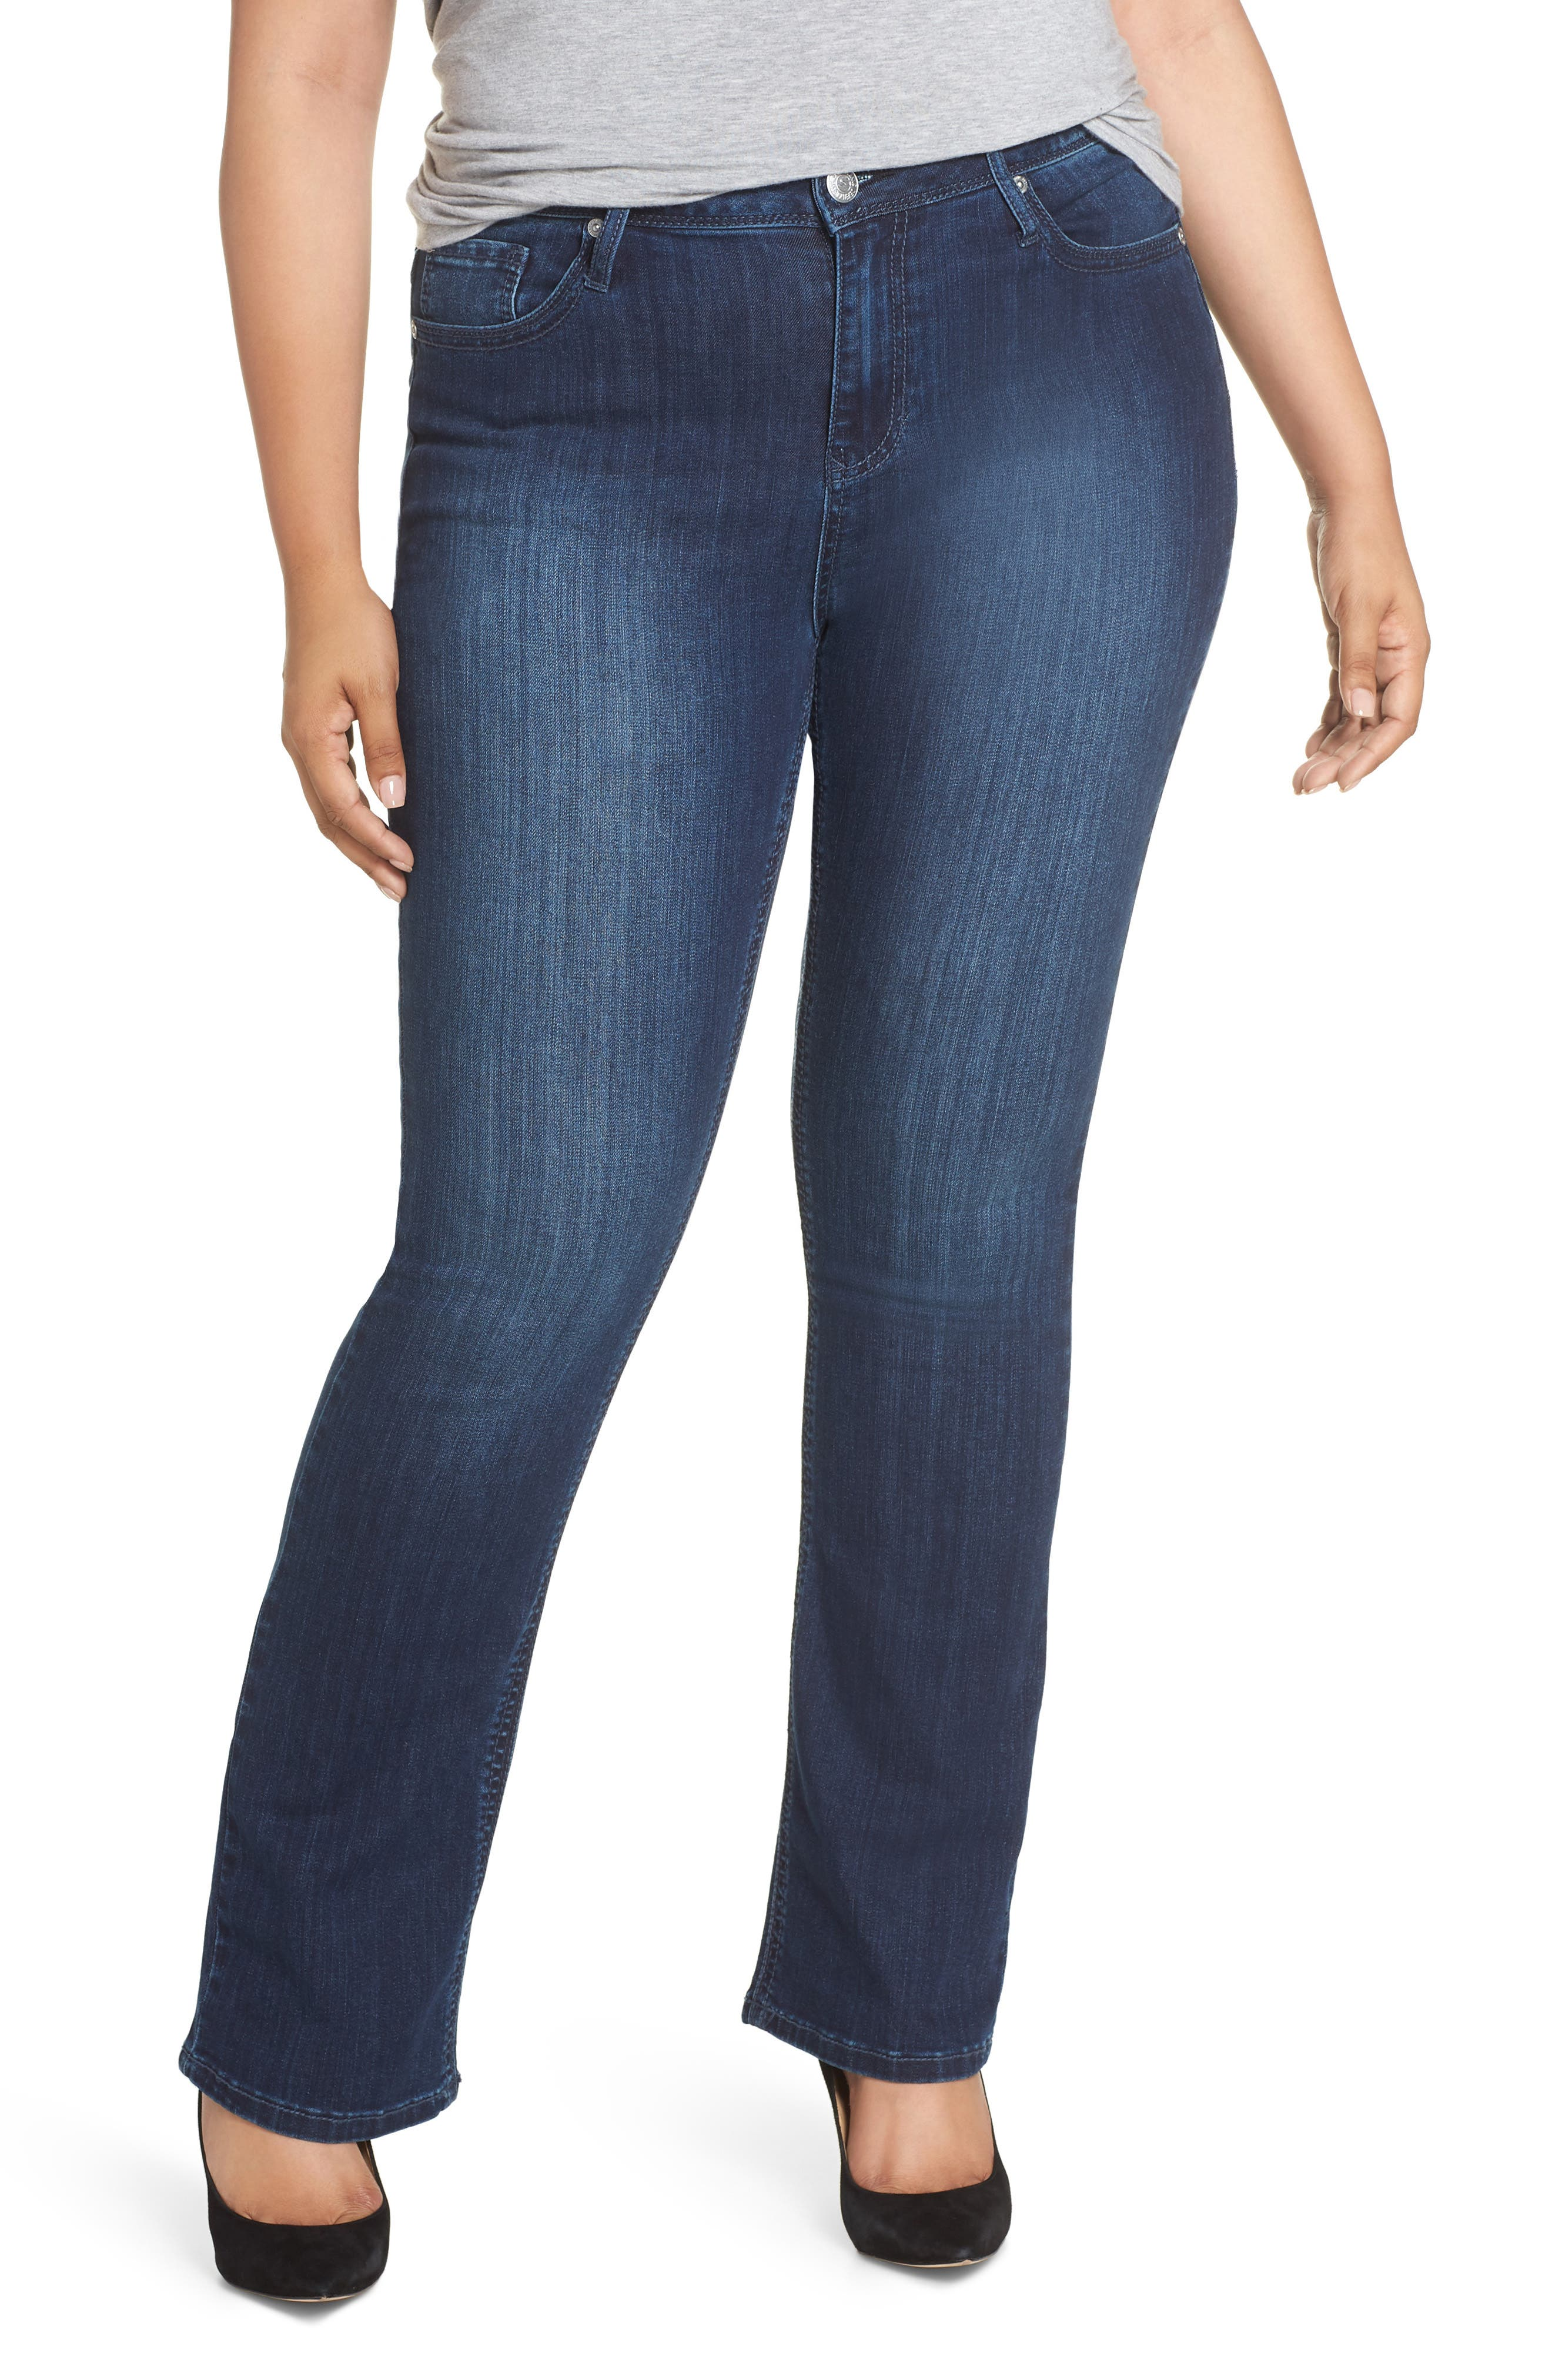 SEVEN7 Rocker Flap Pocket Slim Bootcut Jeans, Main, color, CHALLENGER